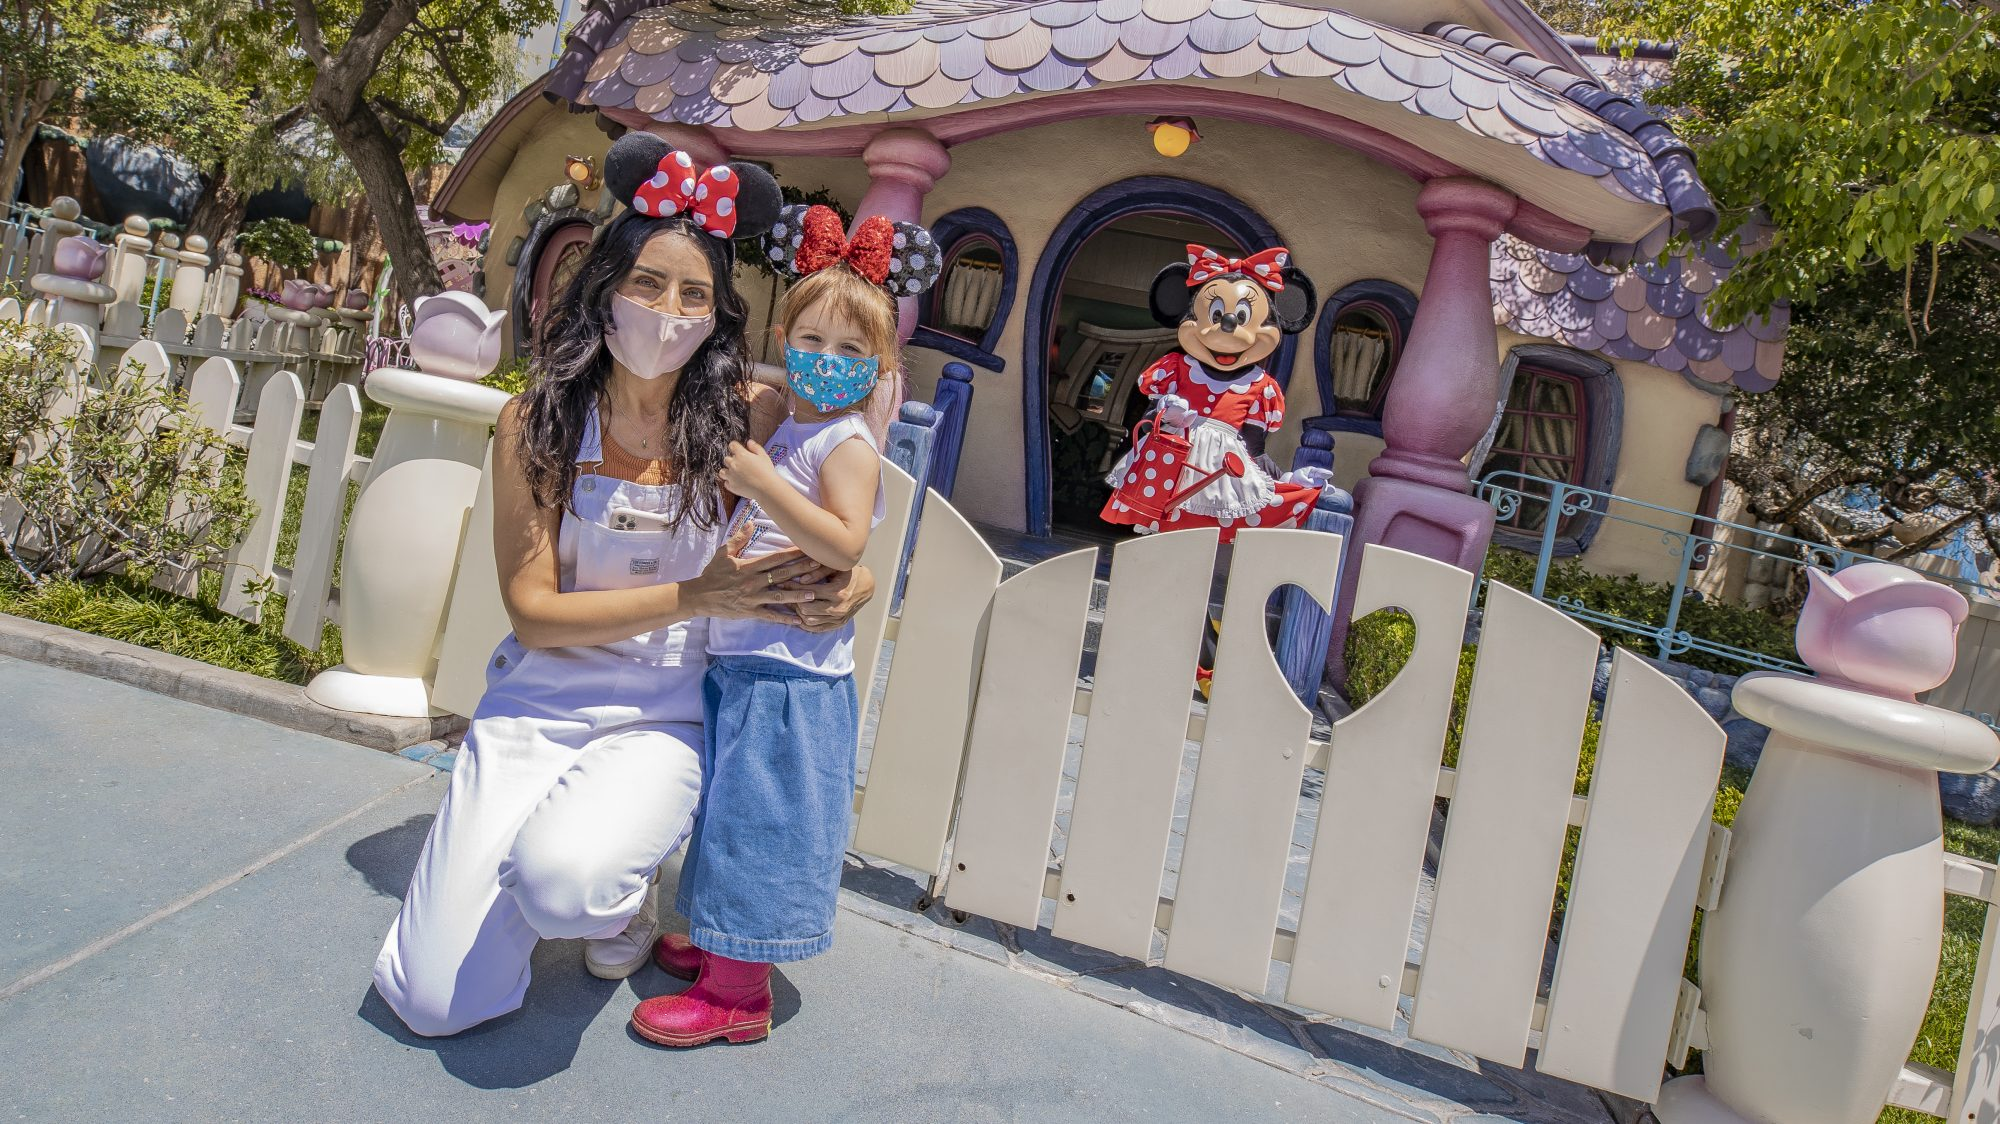 Aislinn Derbez junto a su hija en Disneyland Resort en Anaheim, CA